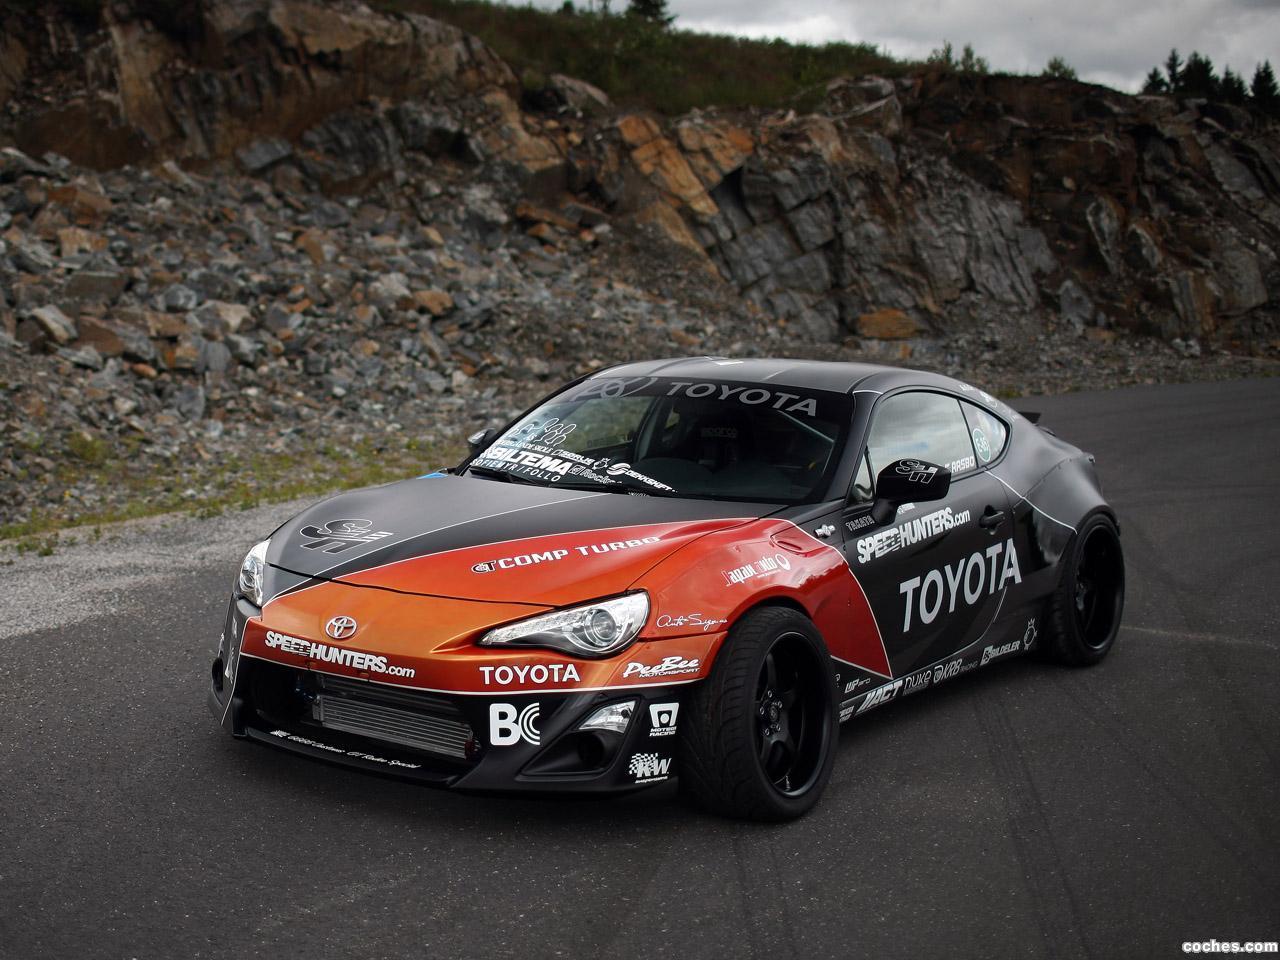 Foto 0 de Speedhunters Toyota GT86 Drift Car 2012